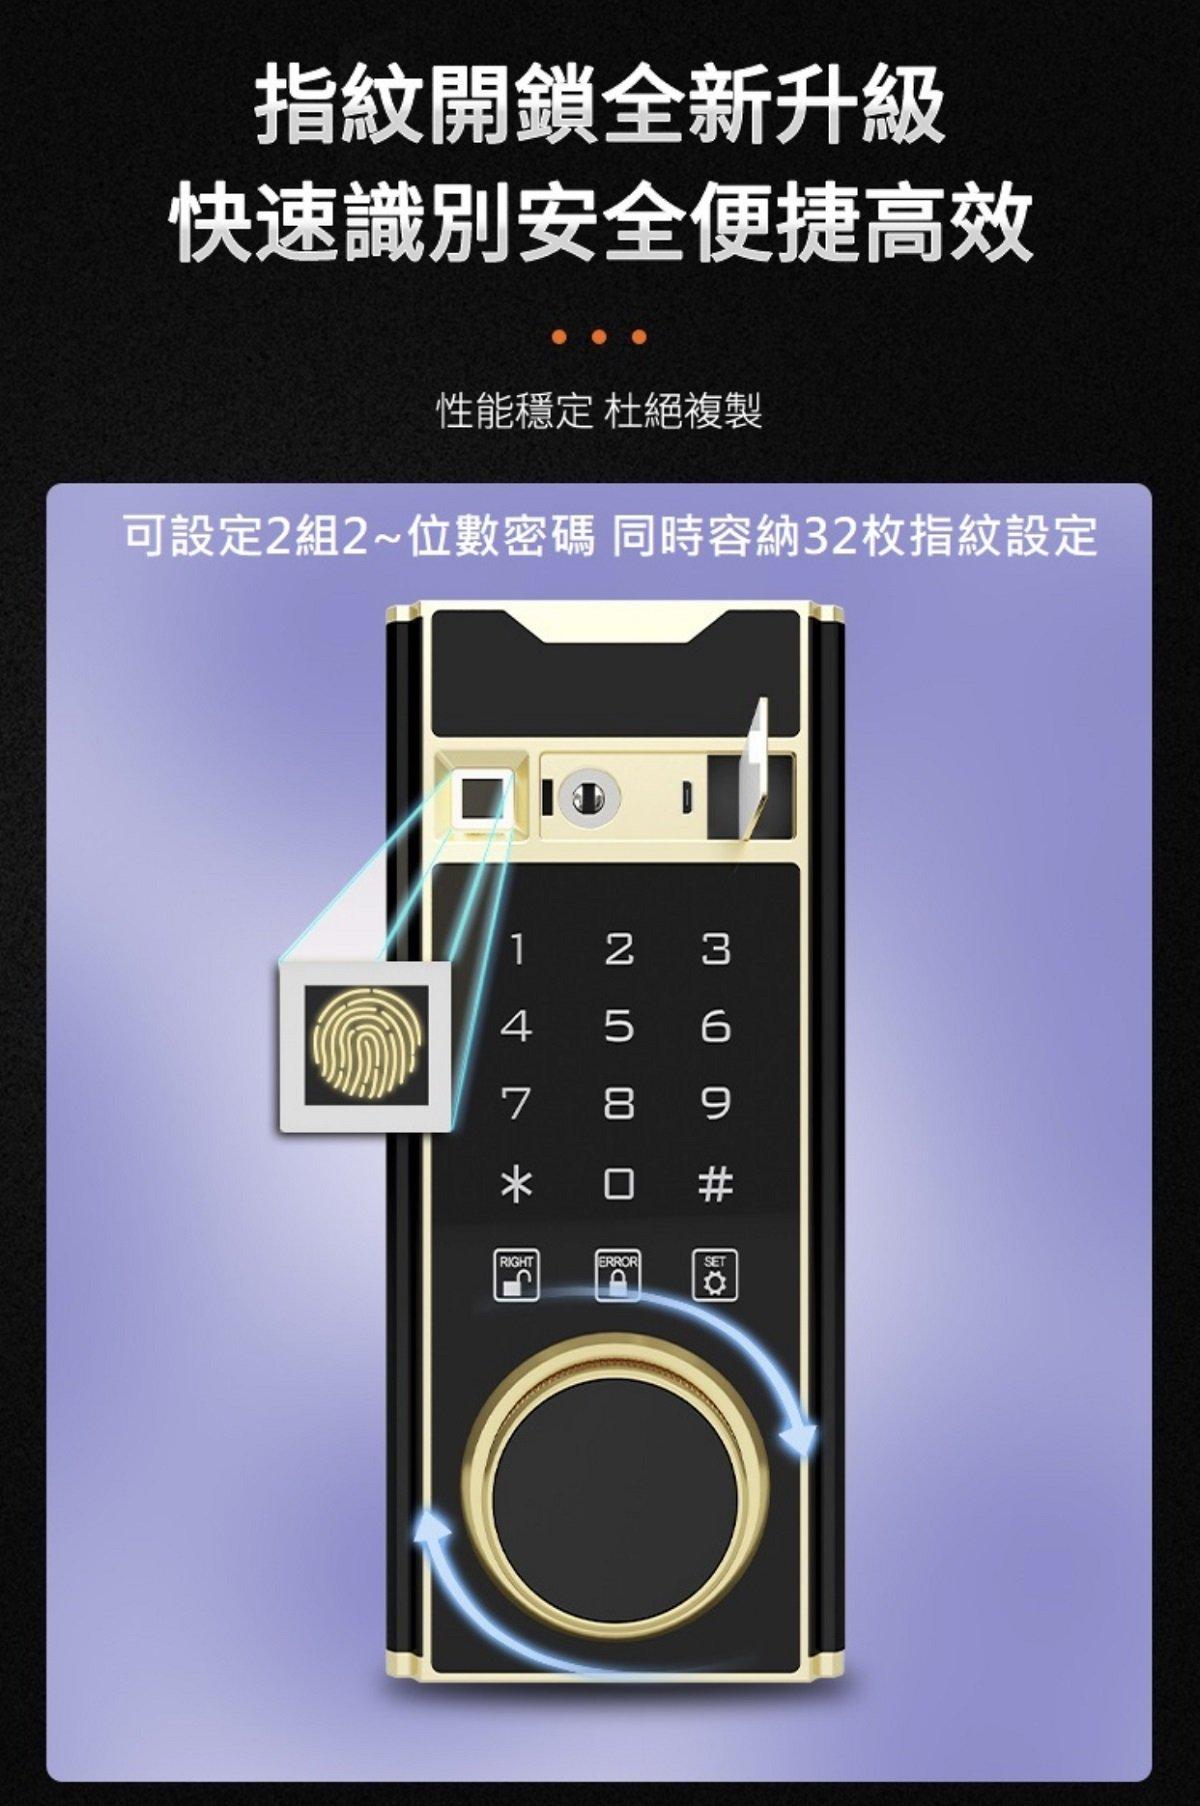 Marketing graphic-PB70-4